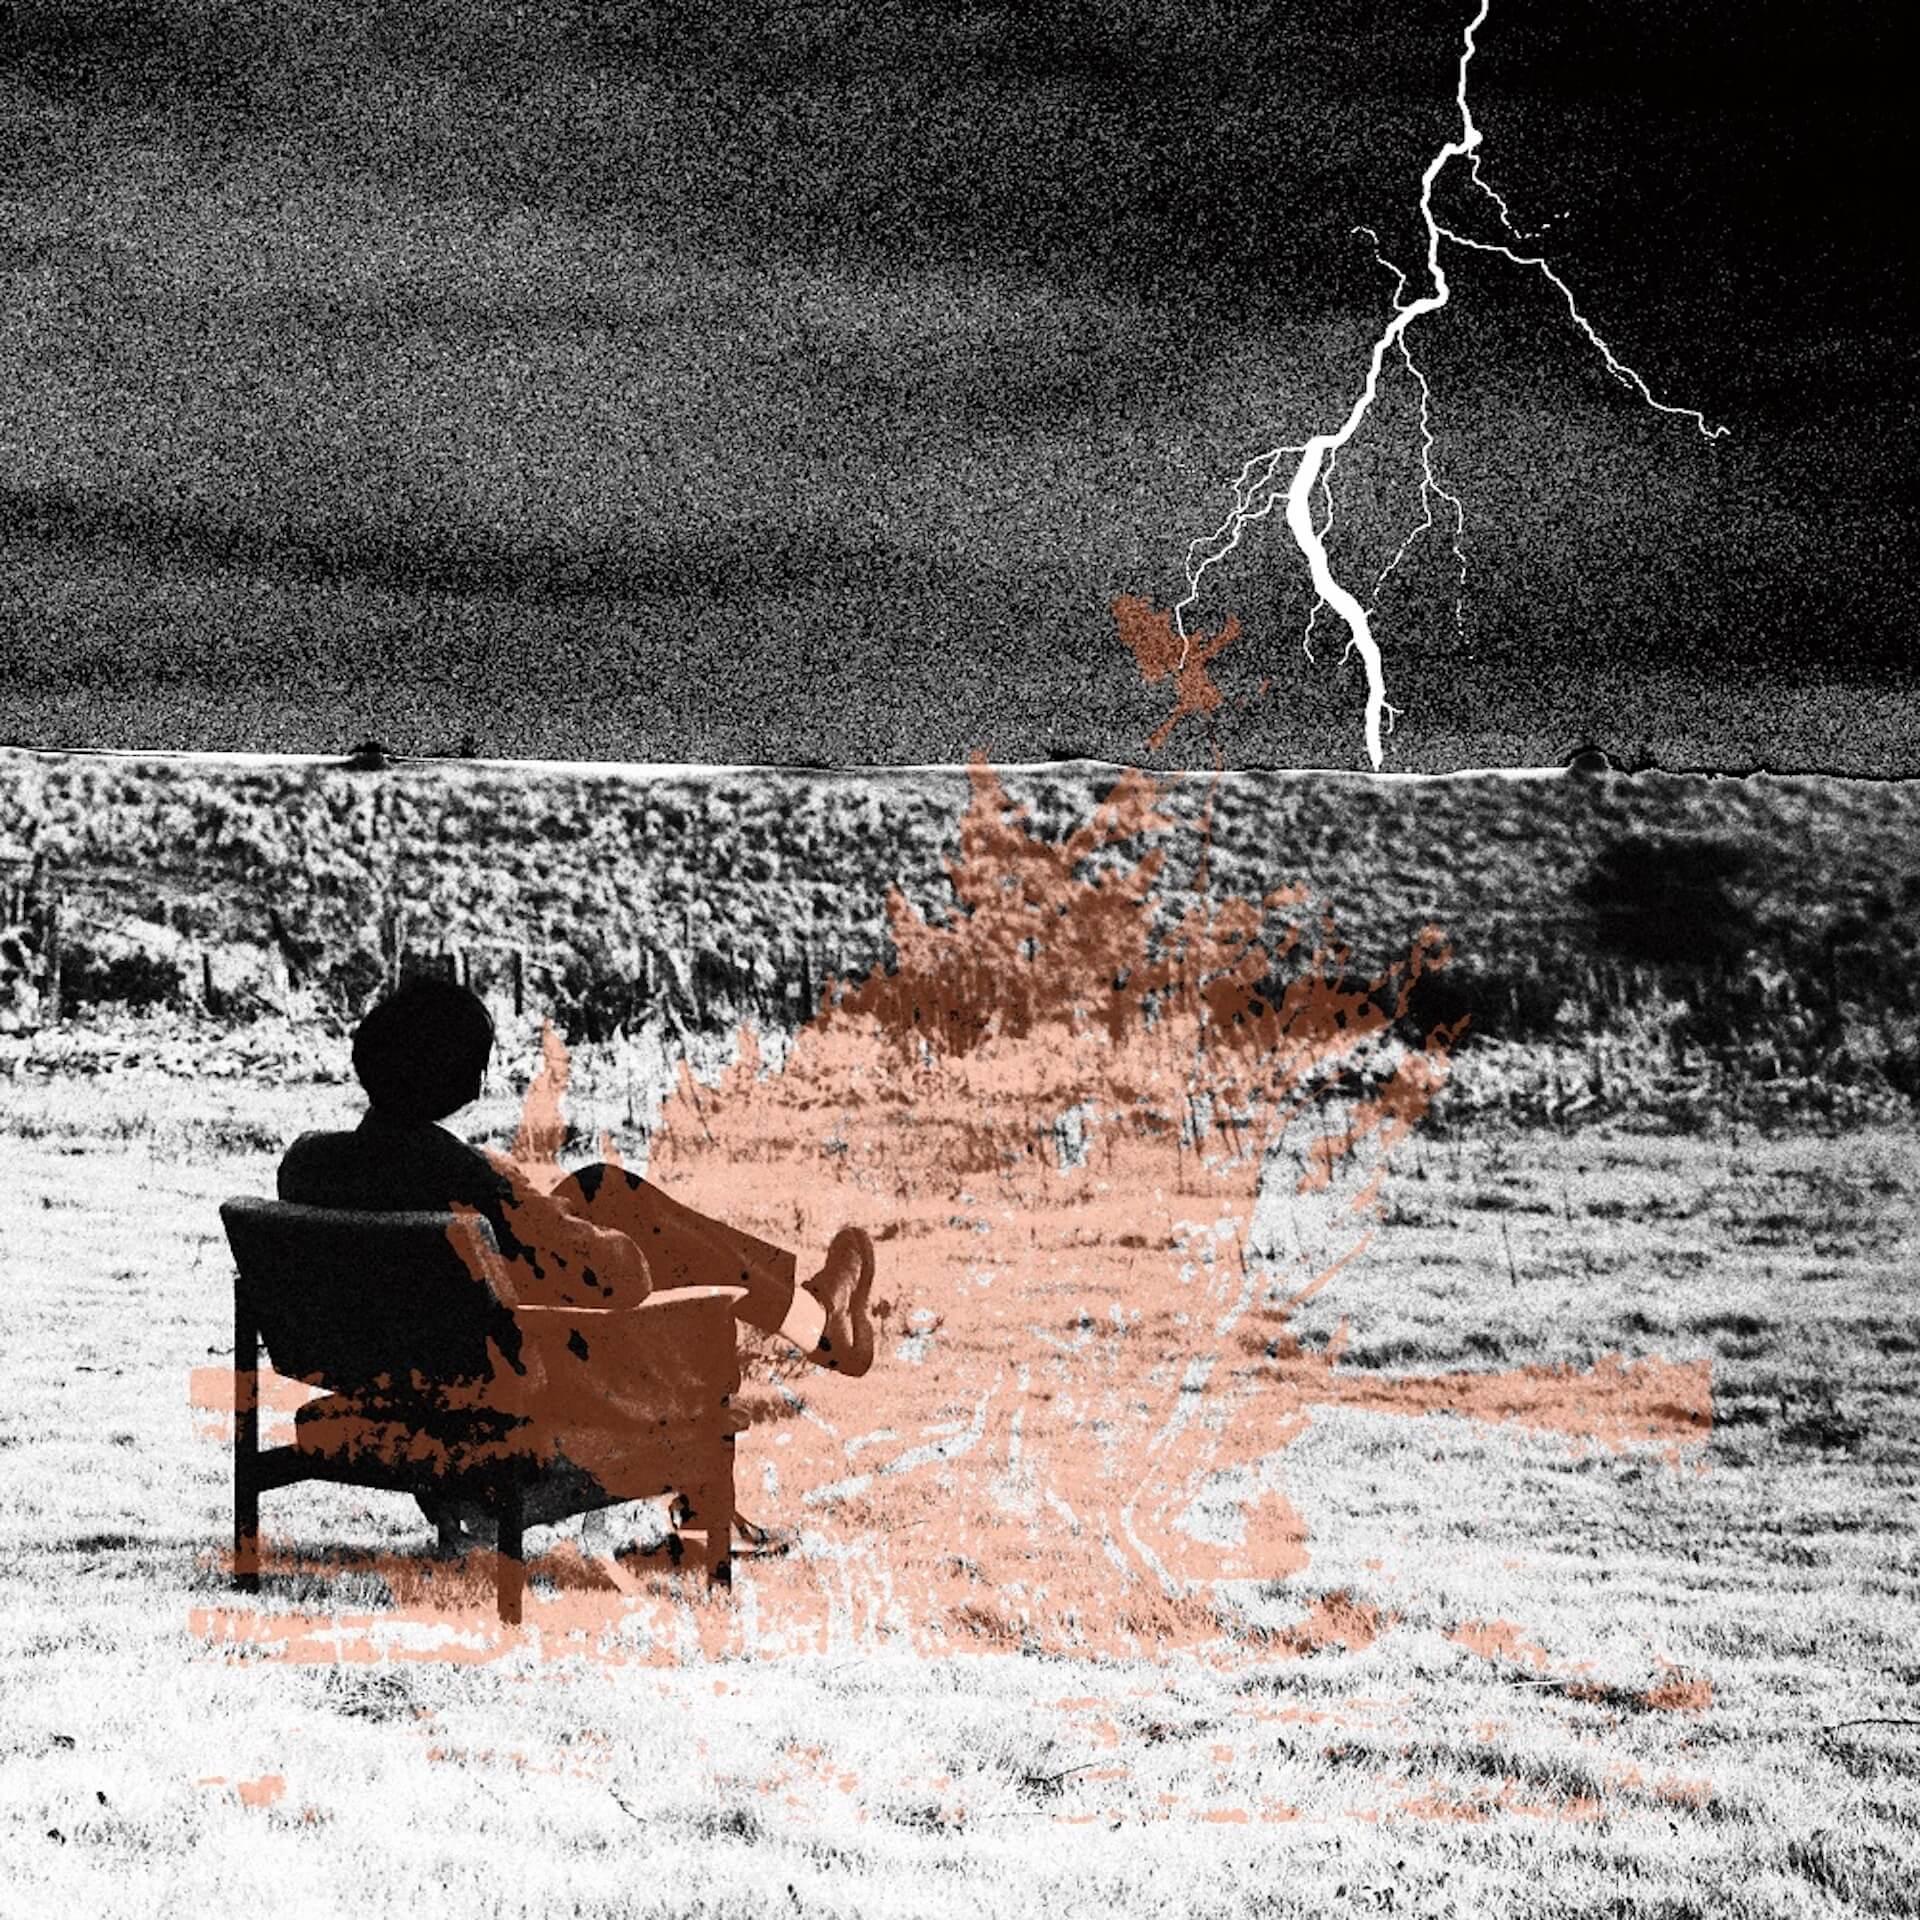 cero髙城晶平ソロプロジェクトShohei Takagi Parallela Botanicaが1stアルバムから「ミッドナイト・ランデヴー」を先行配信 music200319_cero_takagi_2